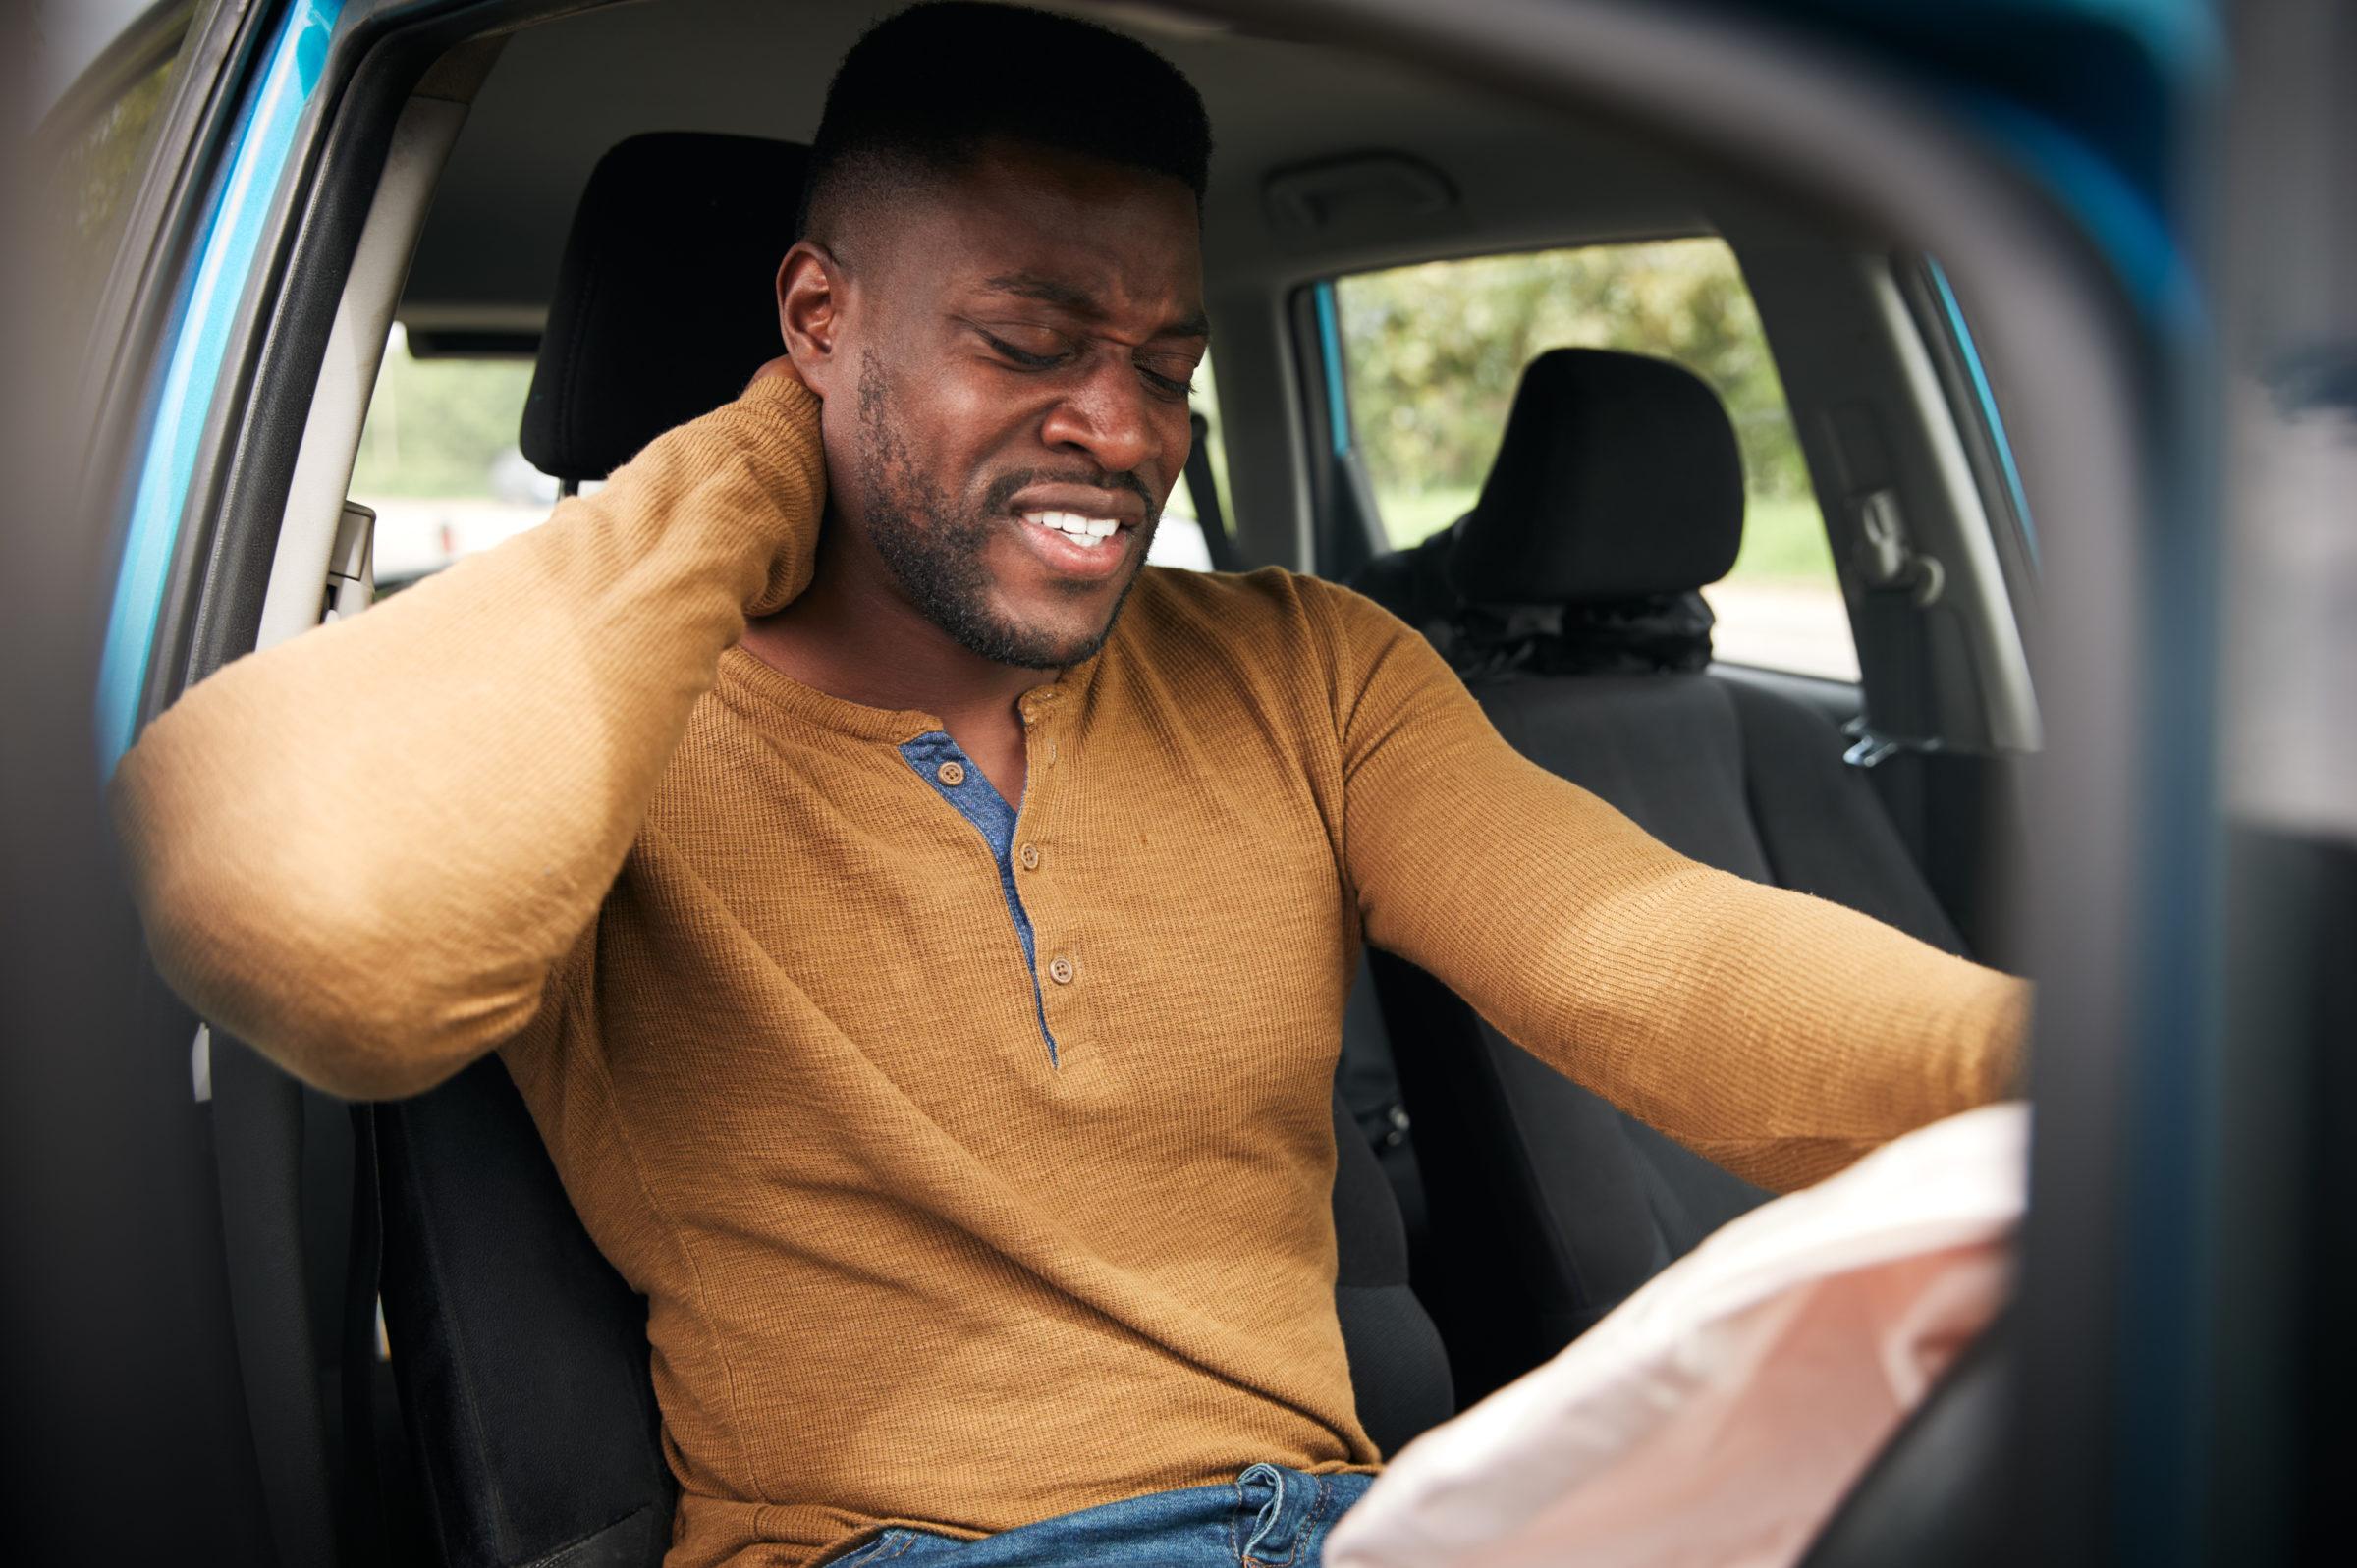 male motorist with whiplash injury in car crash wi 62GK9N8